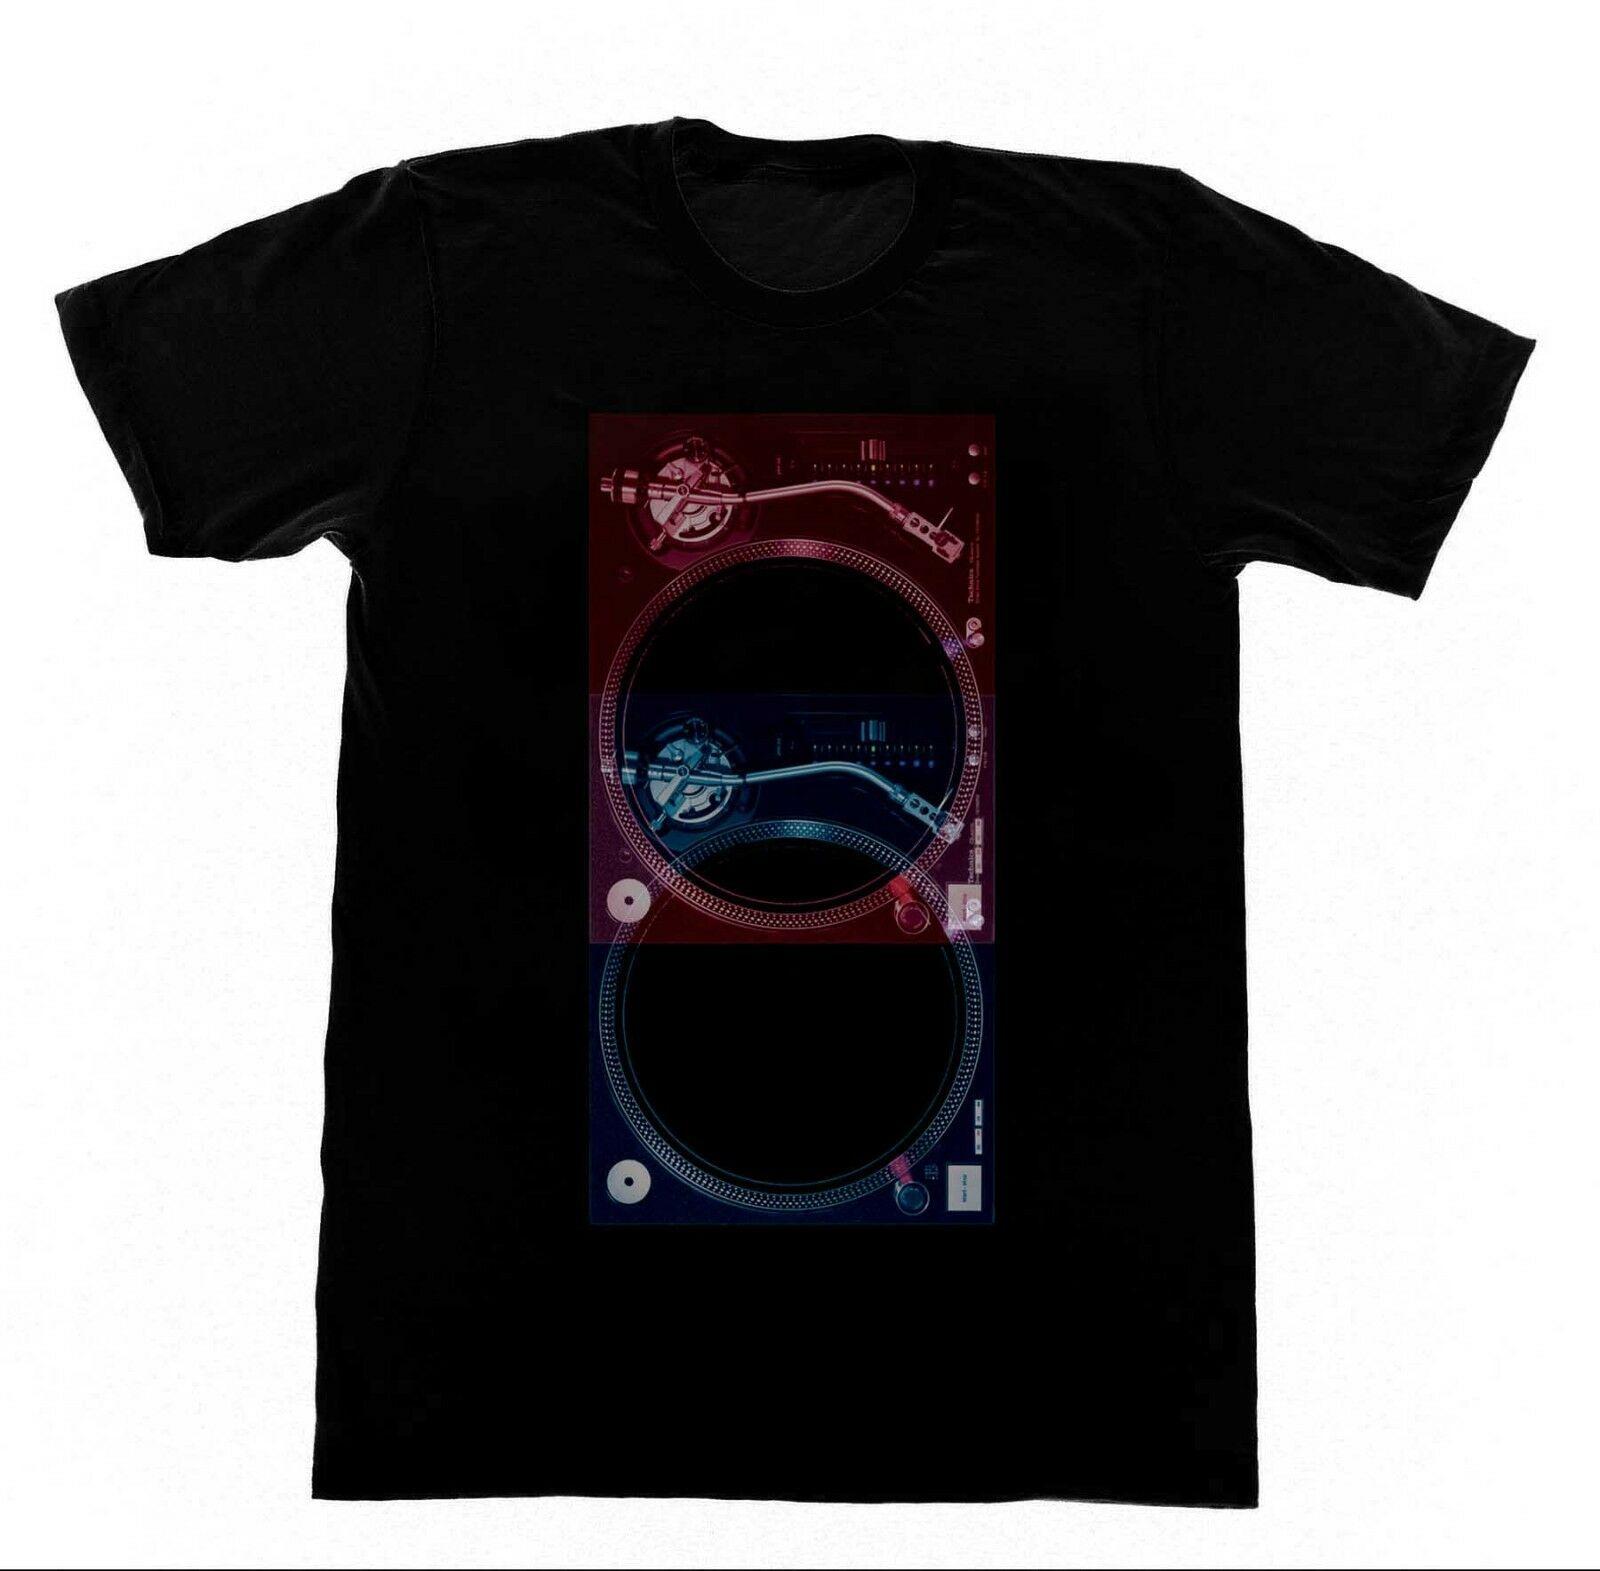 2019 modernas técnicas 1200 camisa 46 Acid Edm Skool Rave House sintetizador Vintage música Moog camiseta Unisex